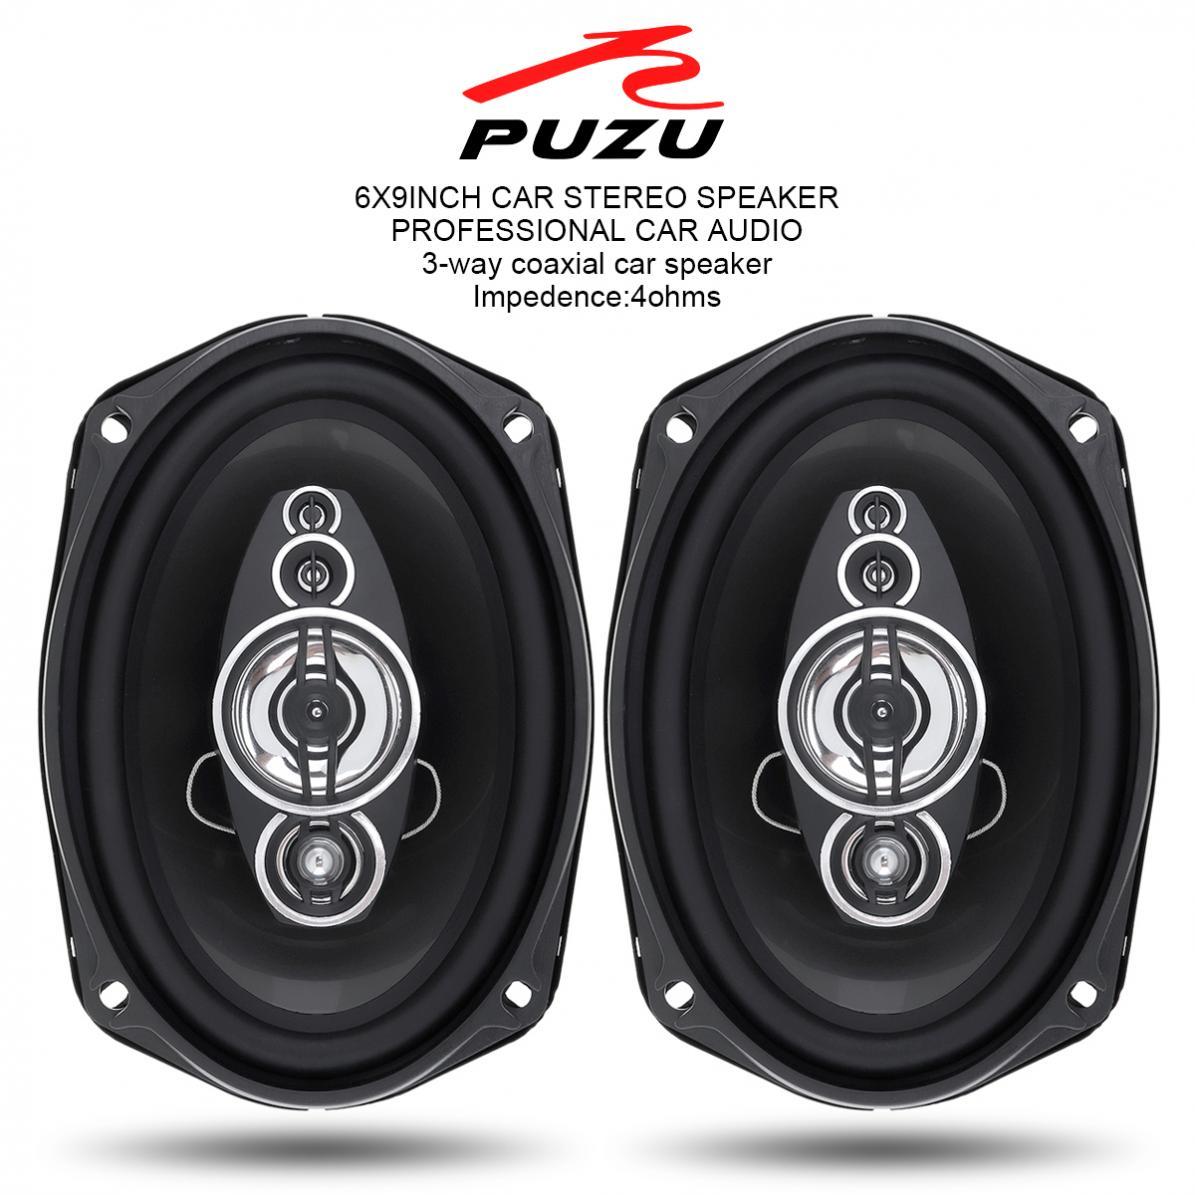 PZ-6922C 2pcs 6x9 Inch Car speakers 360W 3 Way Car Auto sound Audio speaker Music Stereo Full Range Frequency Hifi Speakers h 019 fountek fr88ex full range 3 inch hifi speaker amplifier speaker hot sale 84 3db 1w 1m